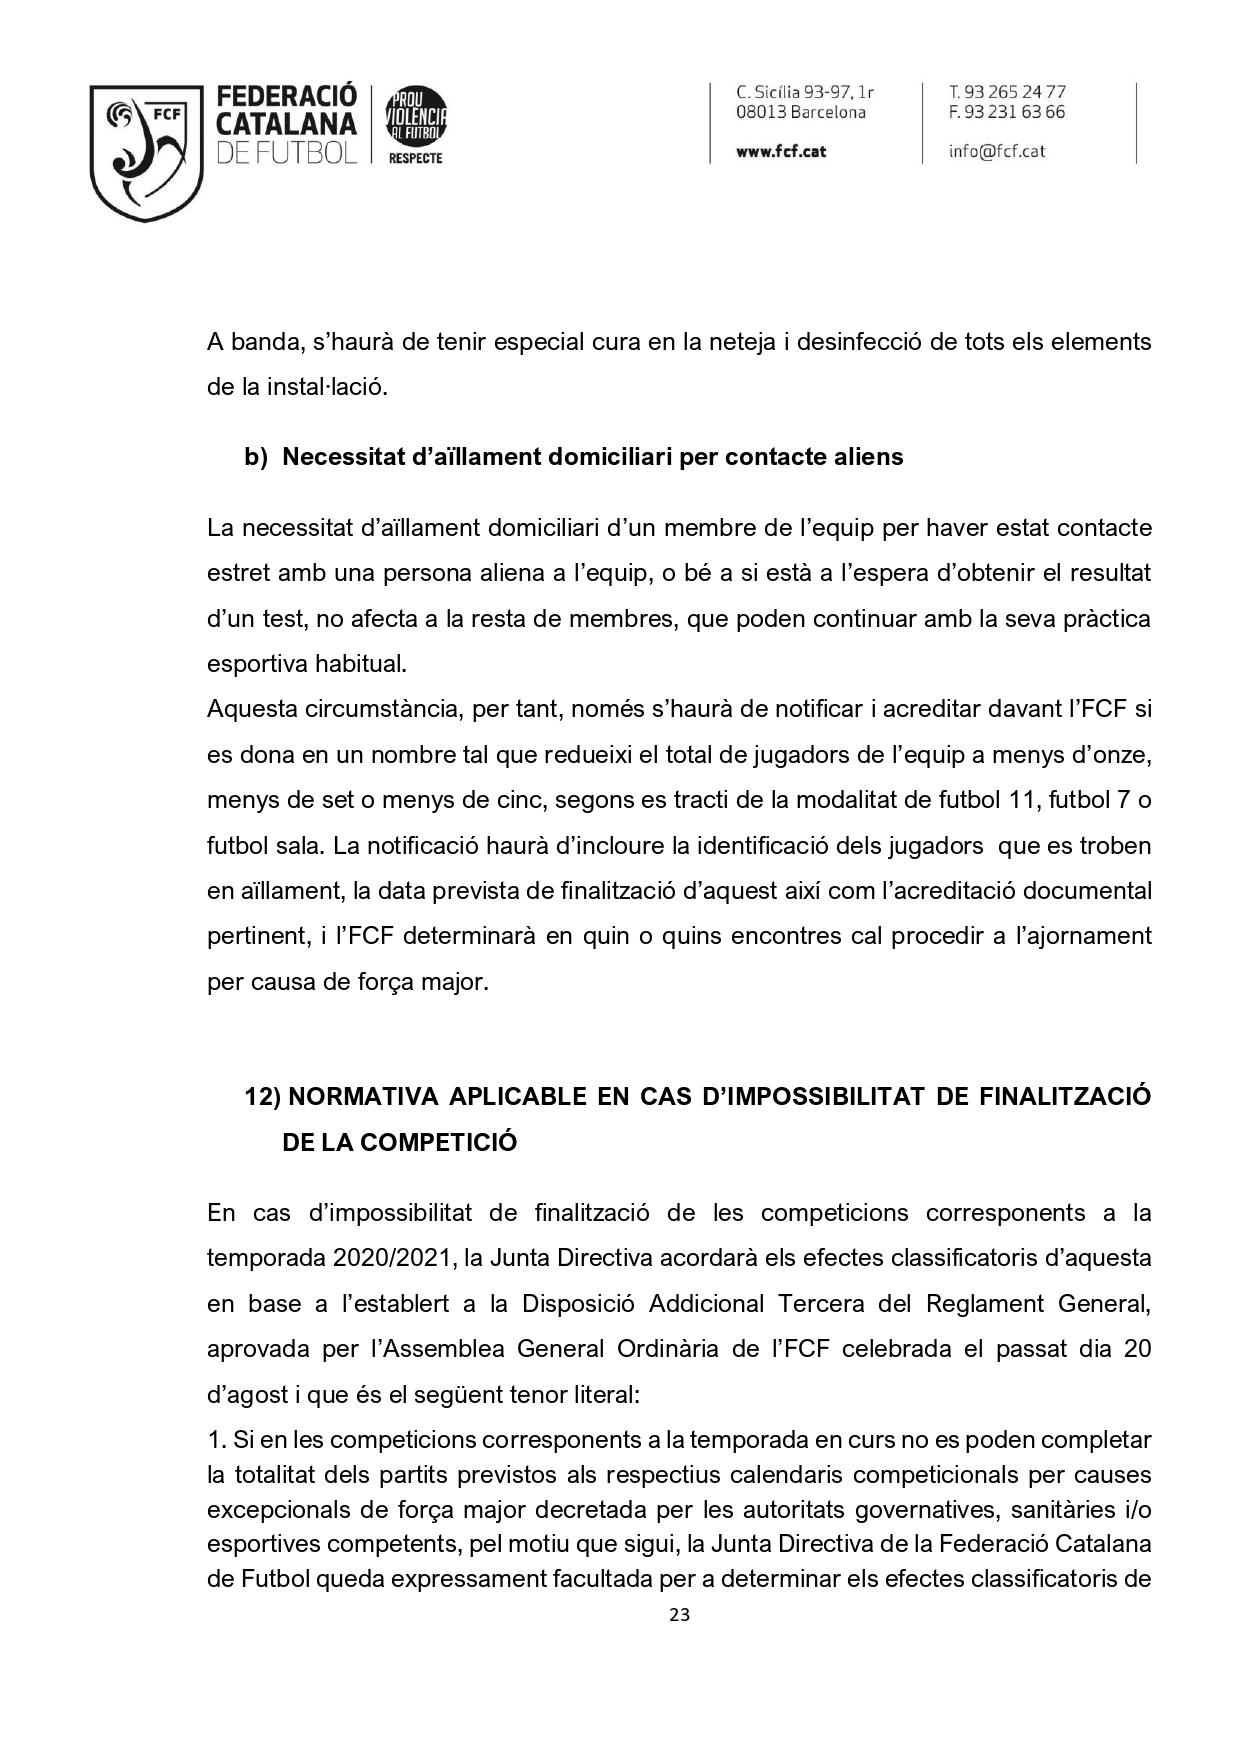 Circular Actualització Protocol Competicions _set21_2_page-0023